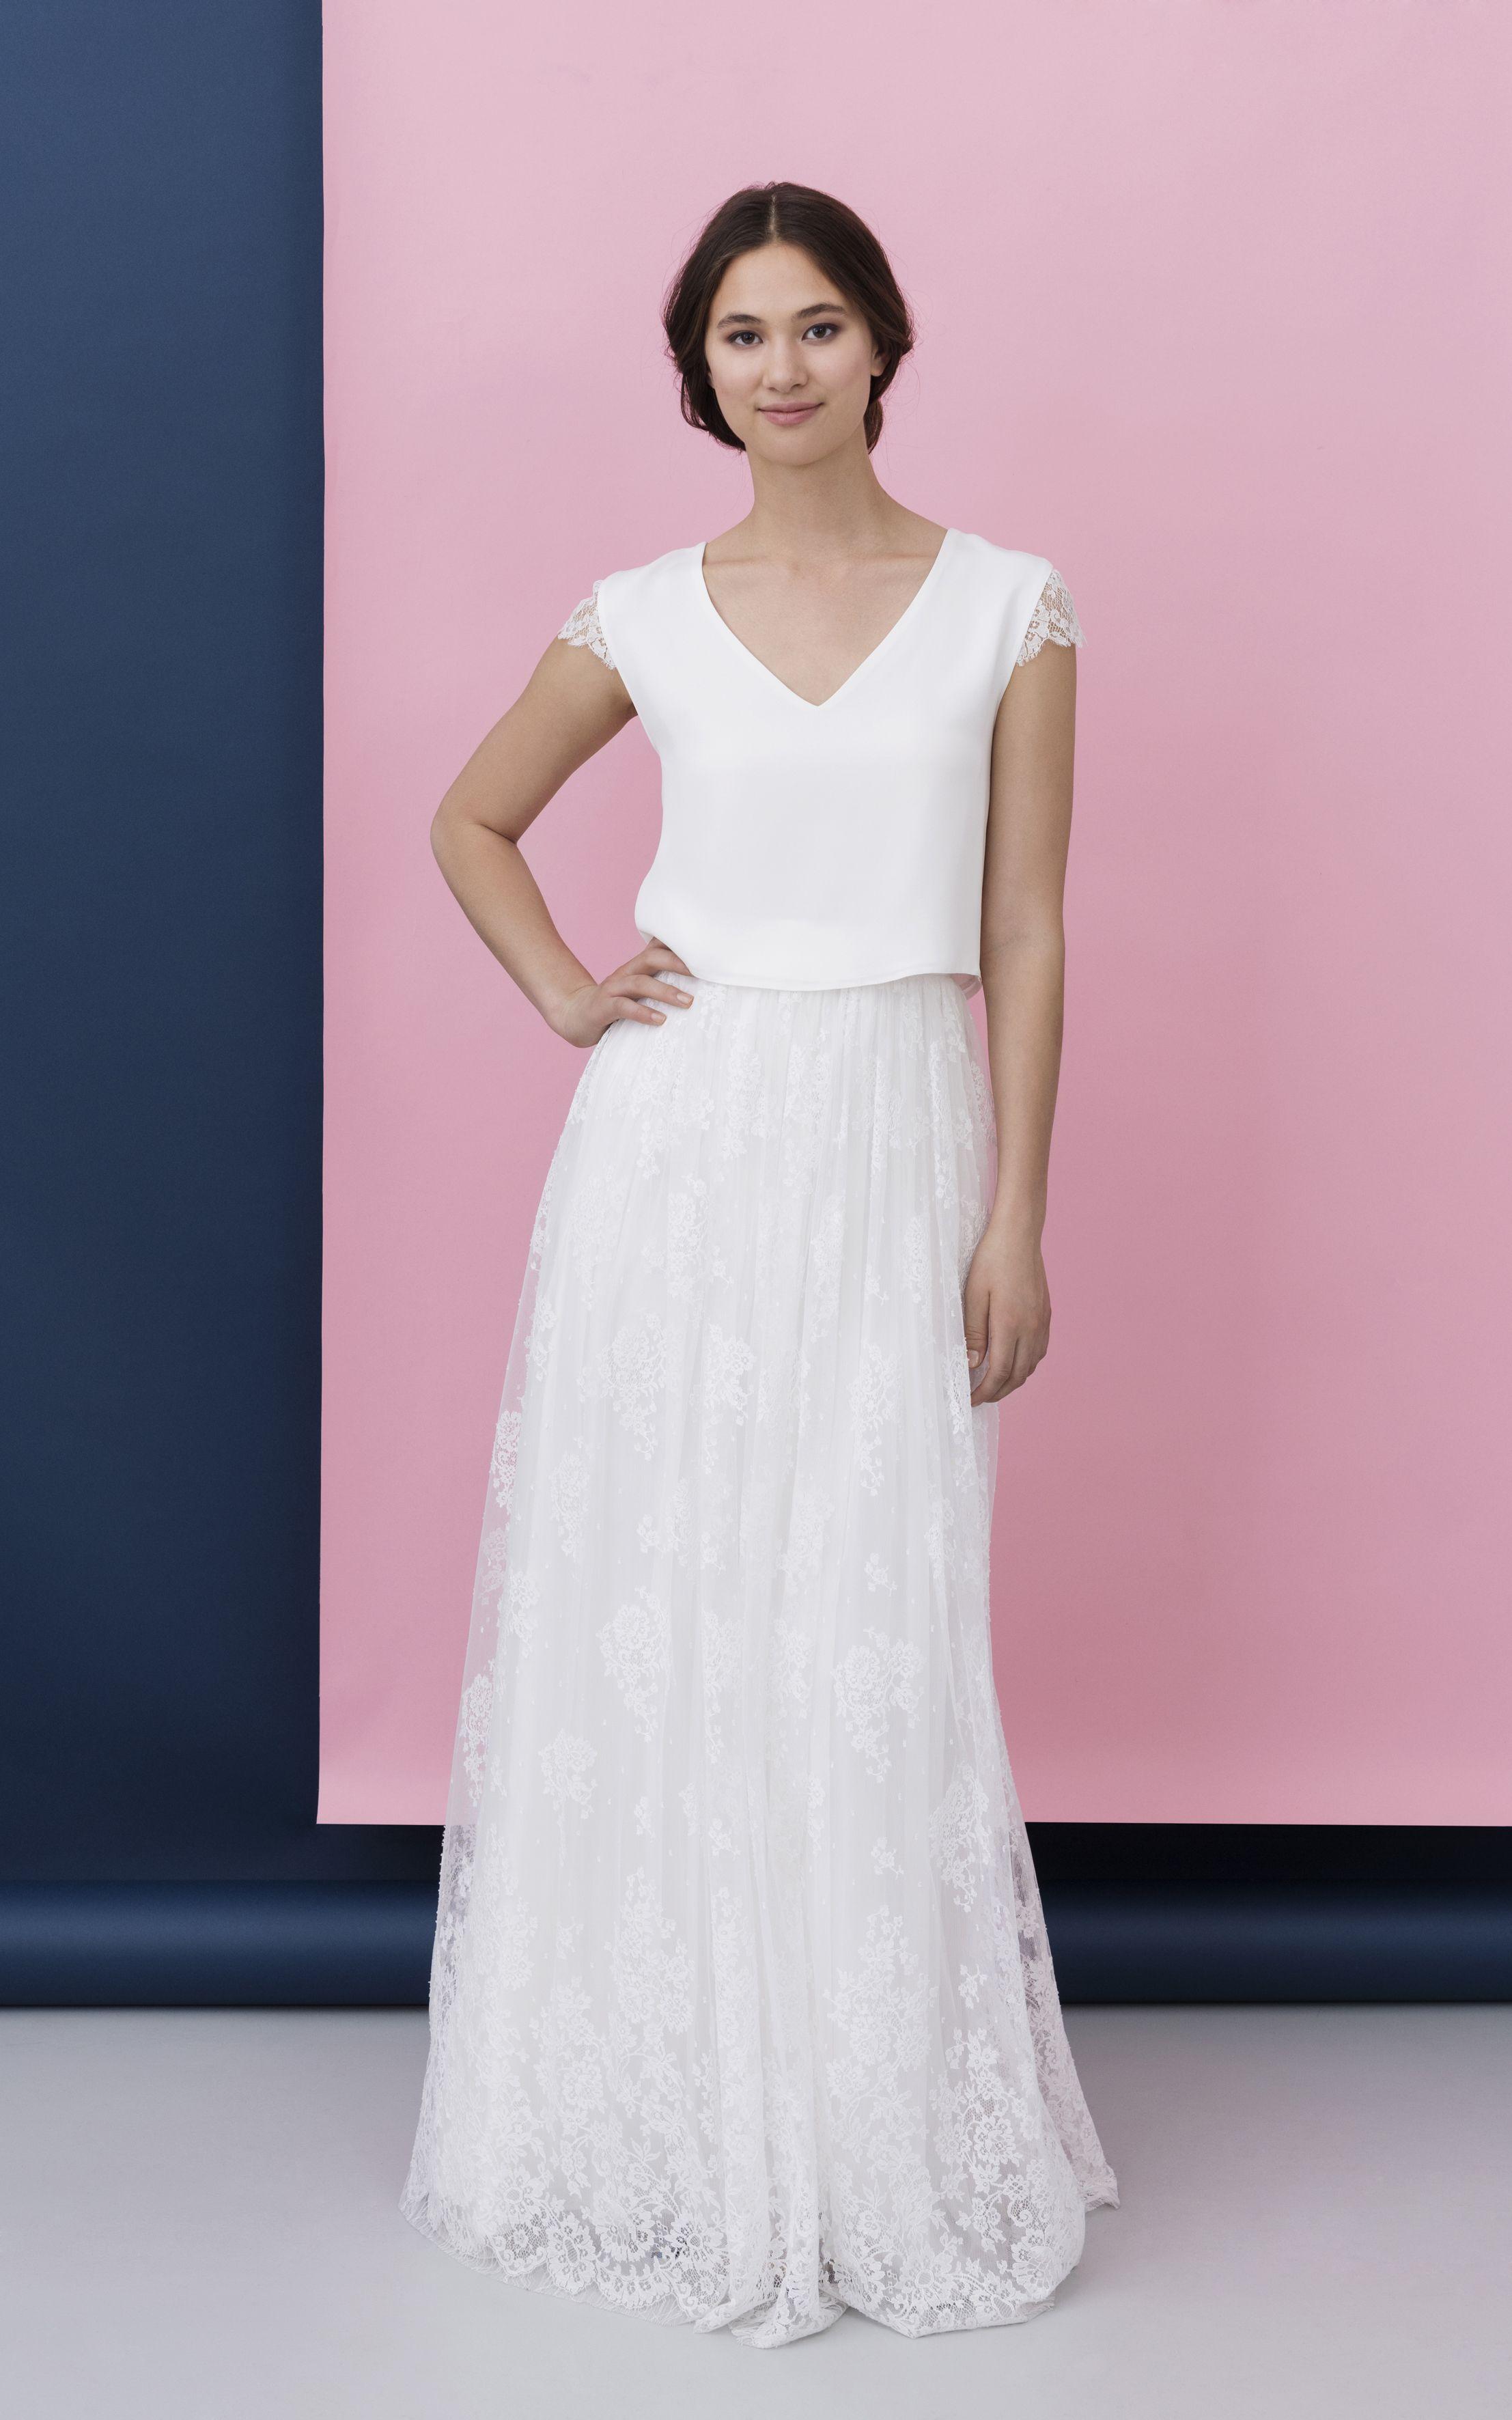 kisui Berlin Collection Bridal Style: Skirt joella & Top lavin ...